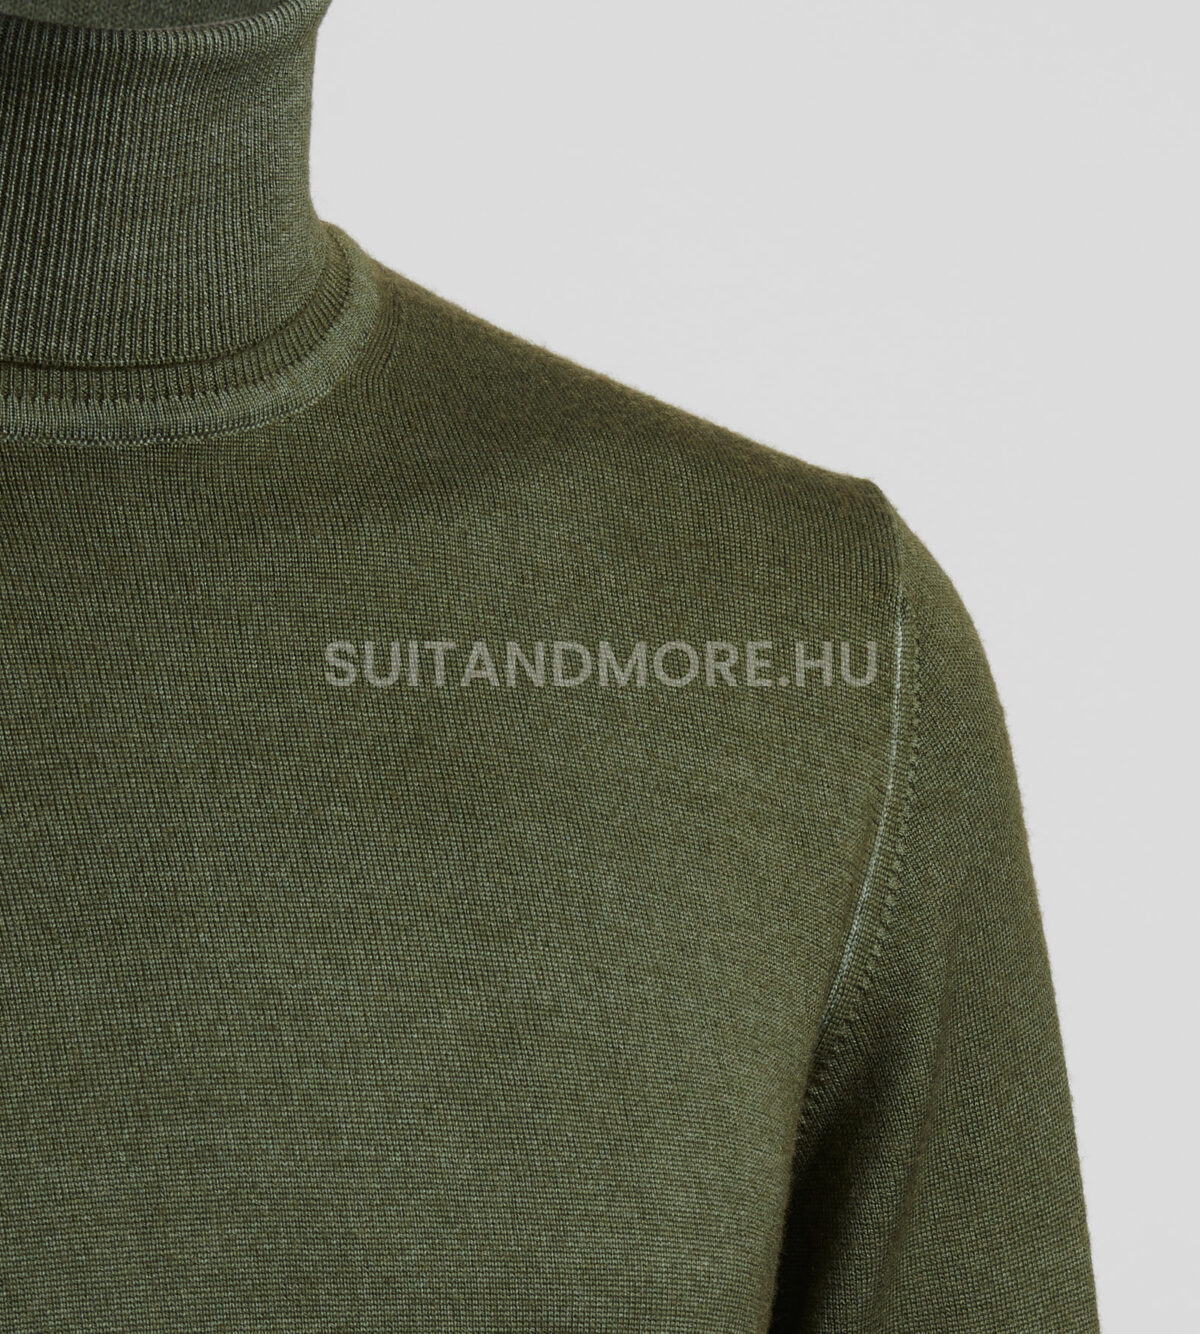 digel-zold-modern-fit-garbo-nyaku-gyapju-pulover-francis1-1-1288001-52-02